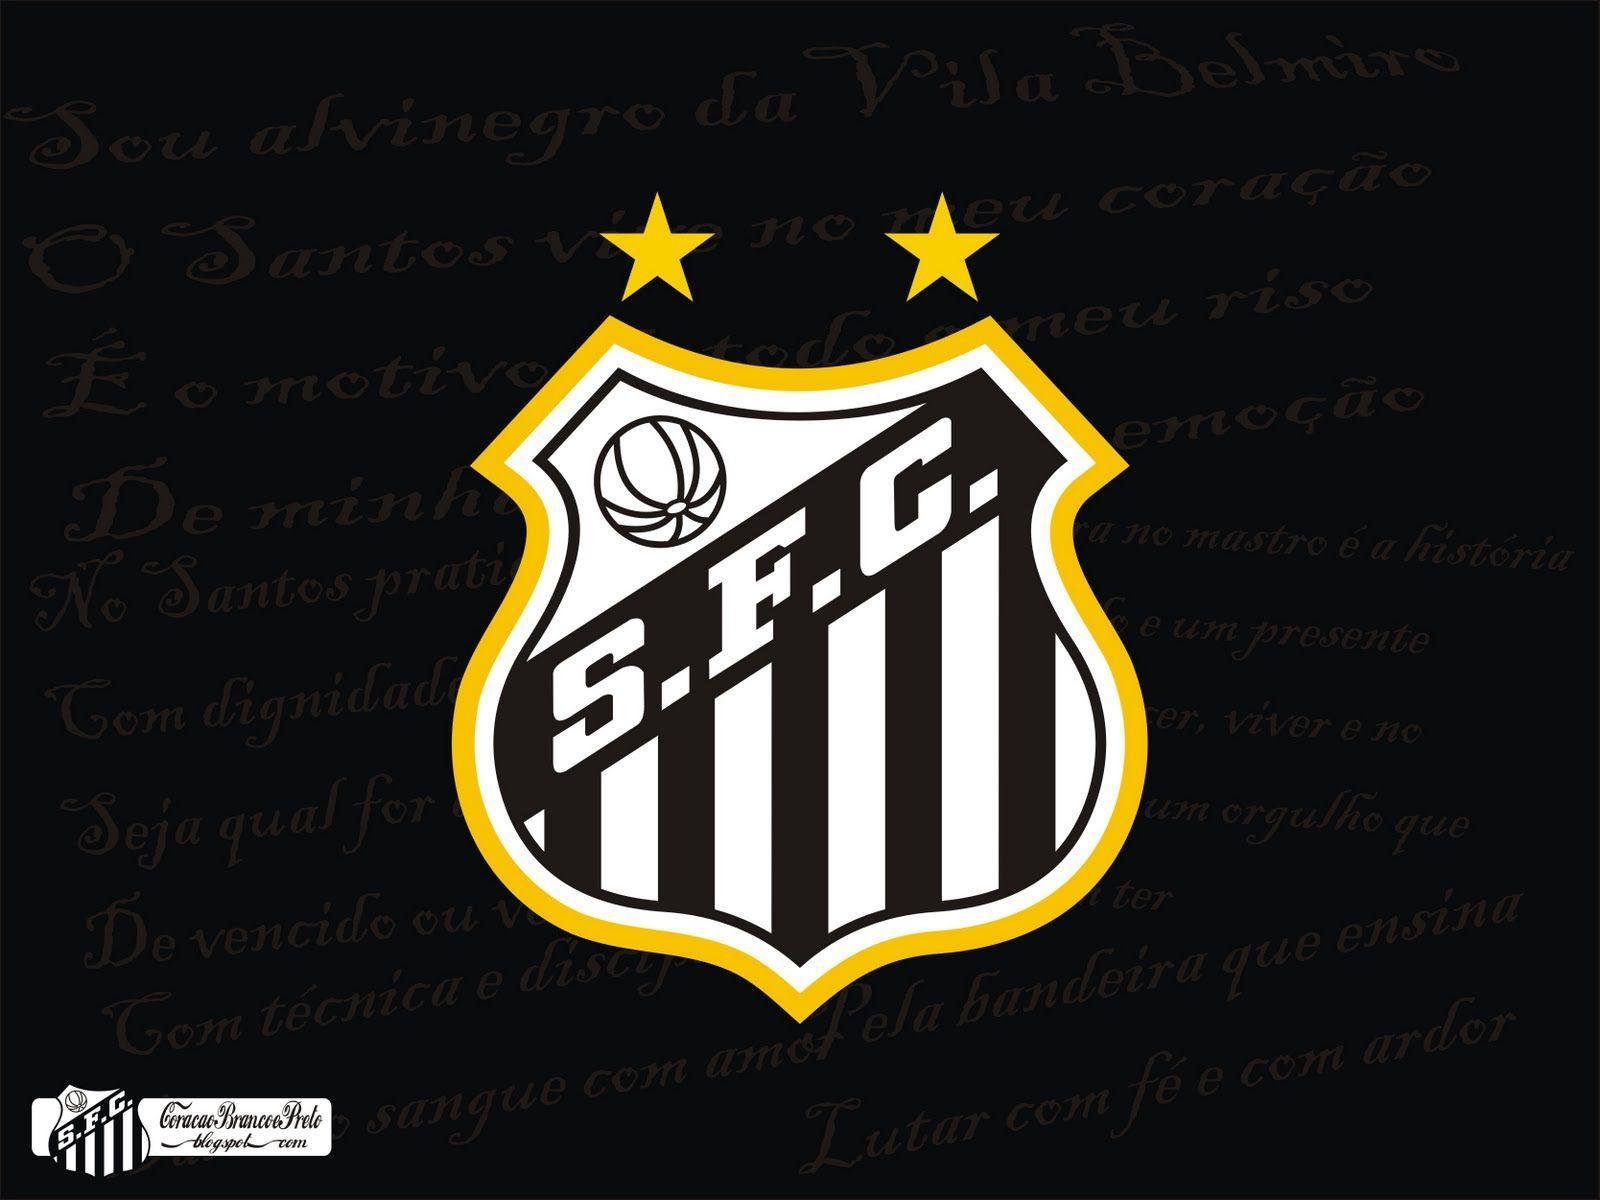 santos futebol clube wallpaper 1600x1200